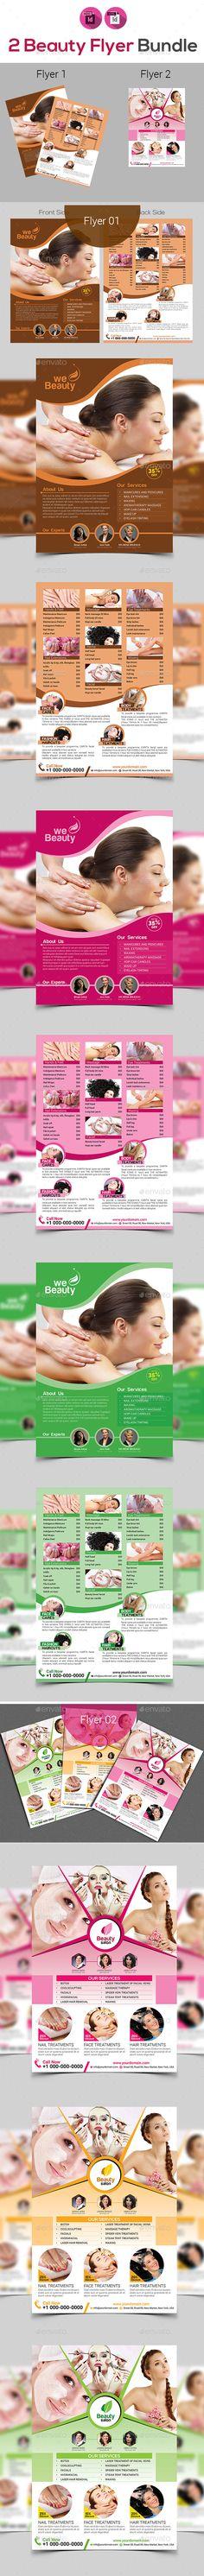 Beauty Spa Salon Flyer Bundle V3 - Flyers Print Templates